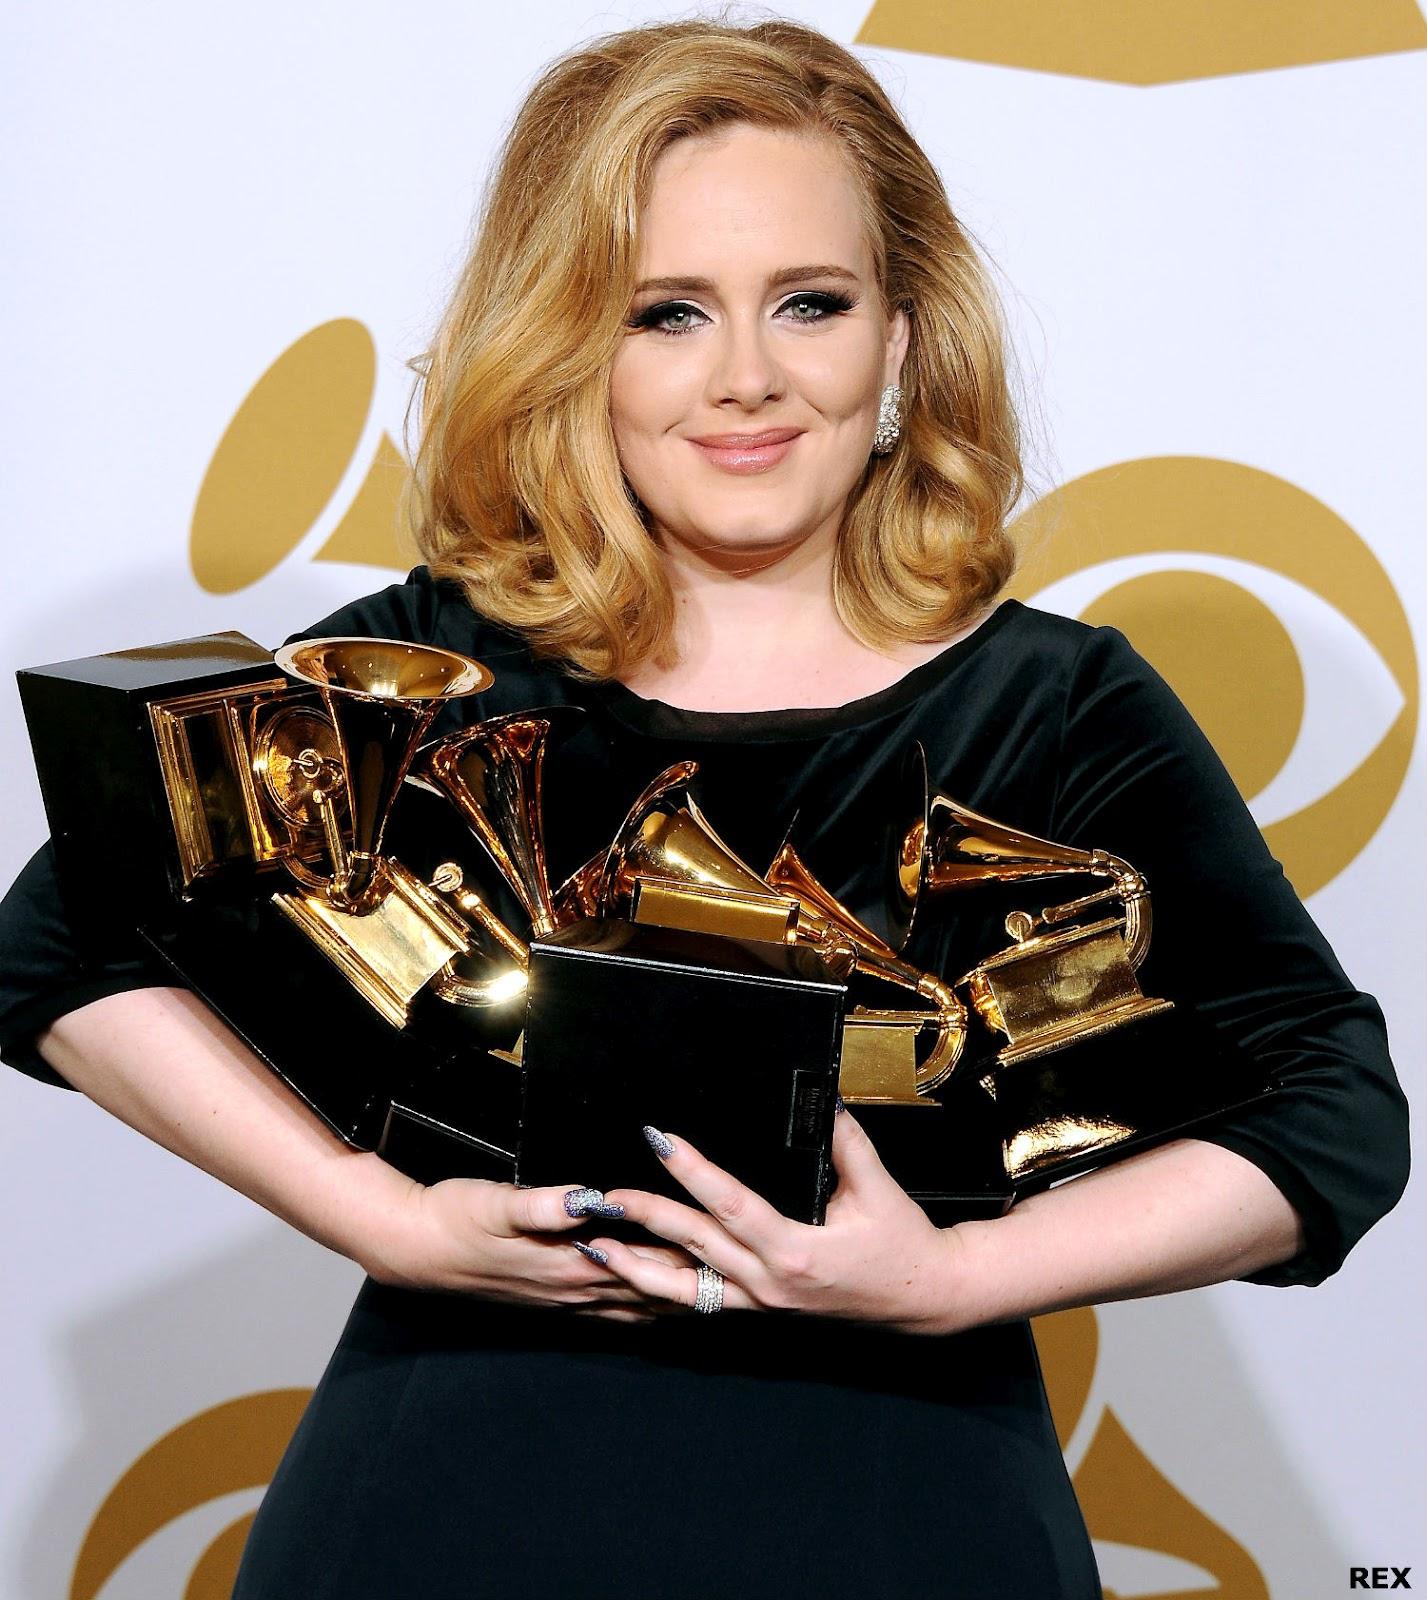 http://1.bp.blogspot.com/-WruX2Hdv2UU/T0zw-cixRXI/AAAAAAAAGSU/m8Q3uGjTRsI/s1600/Adele+grammy+2012.jpg